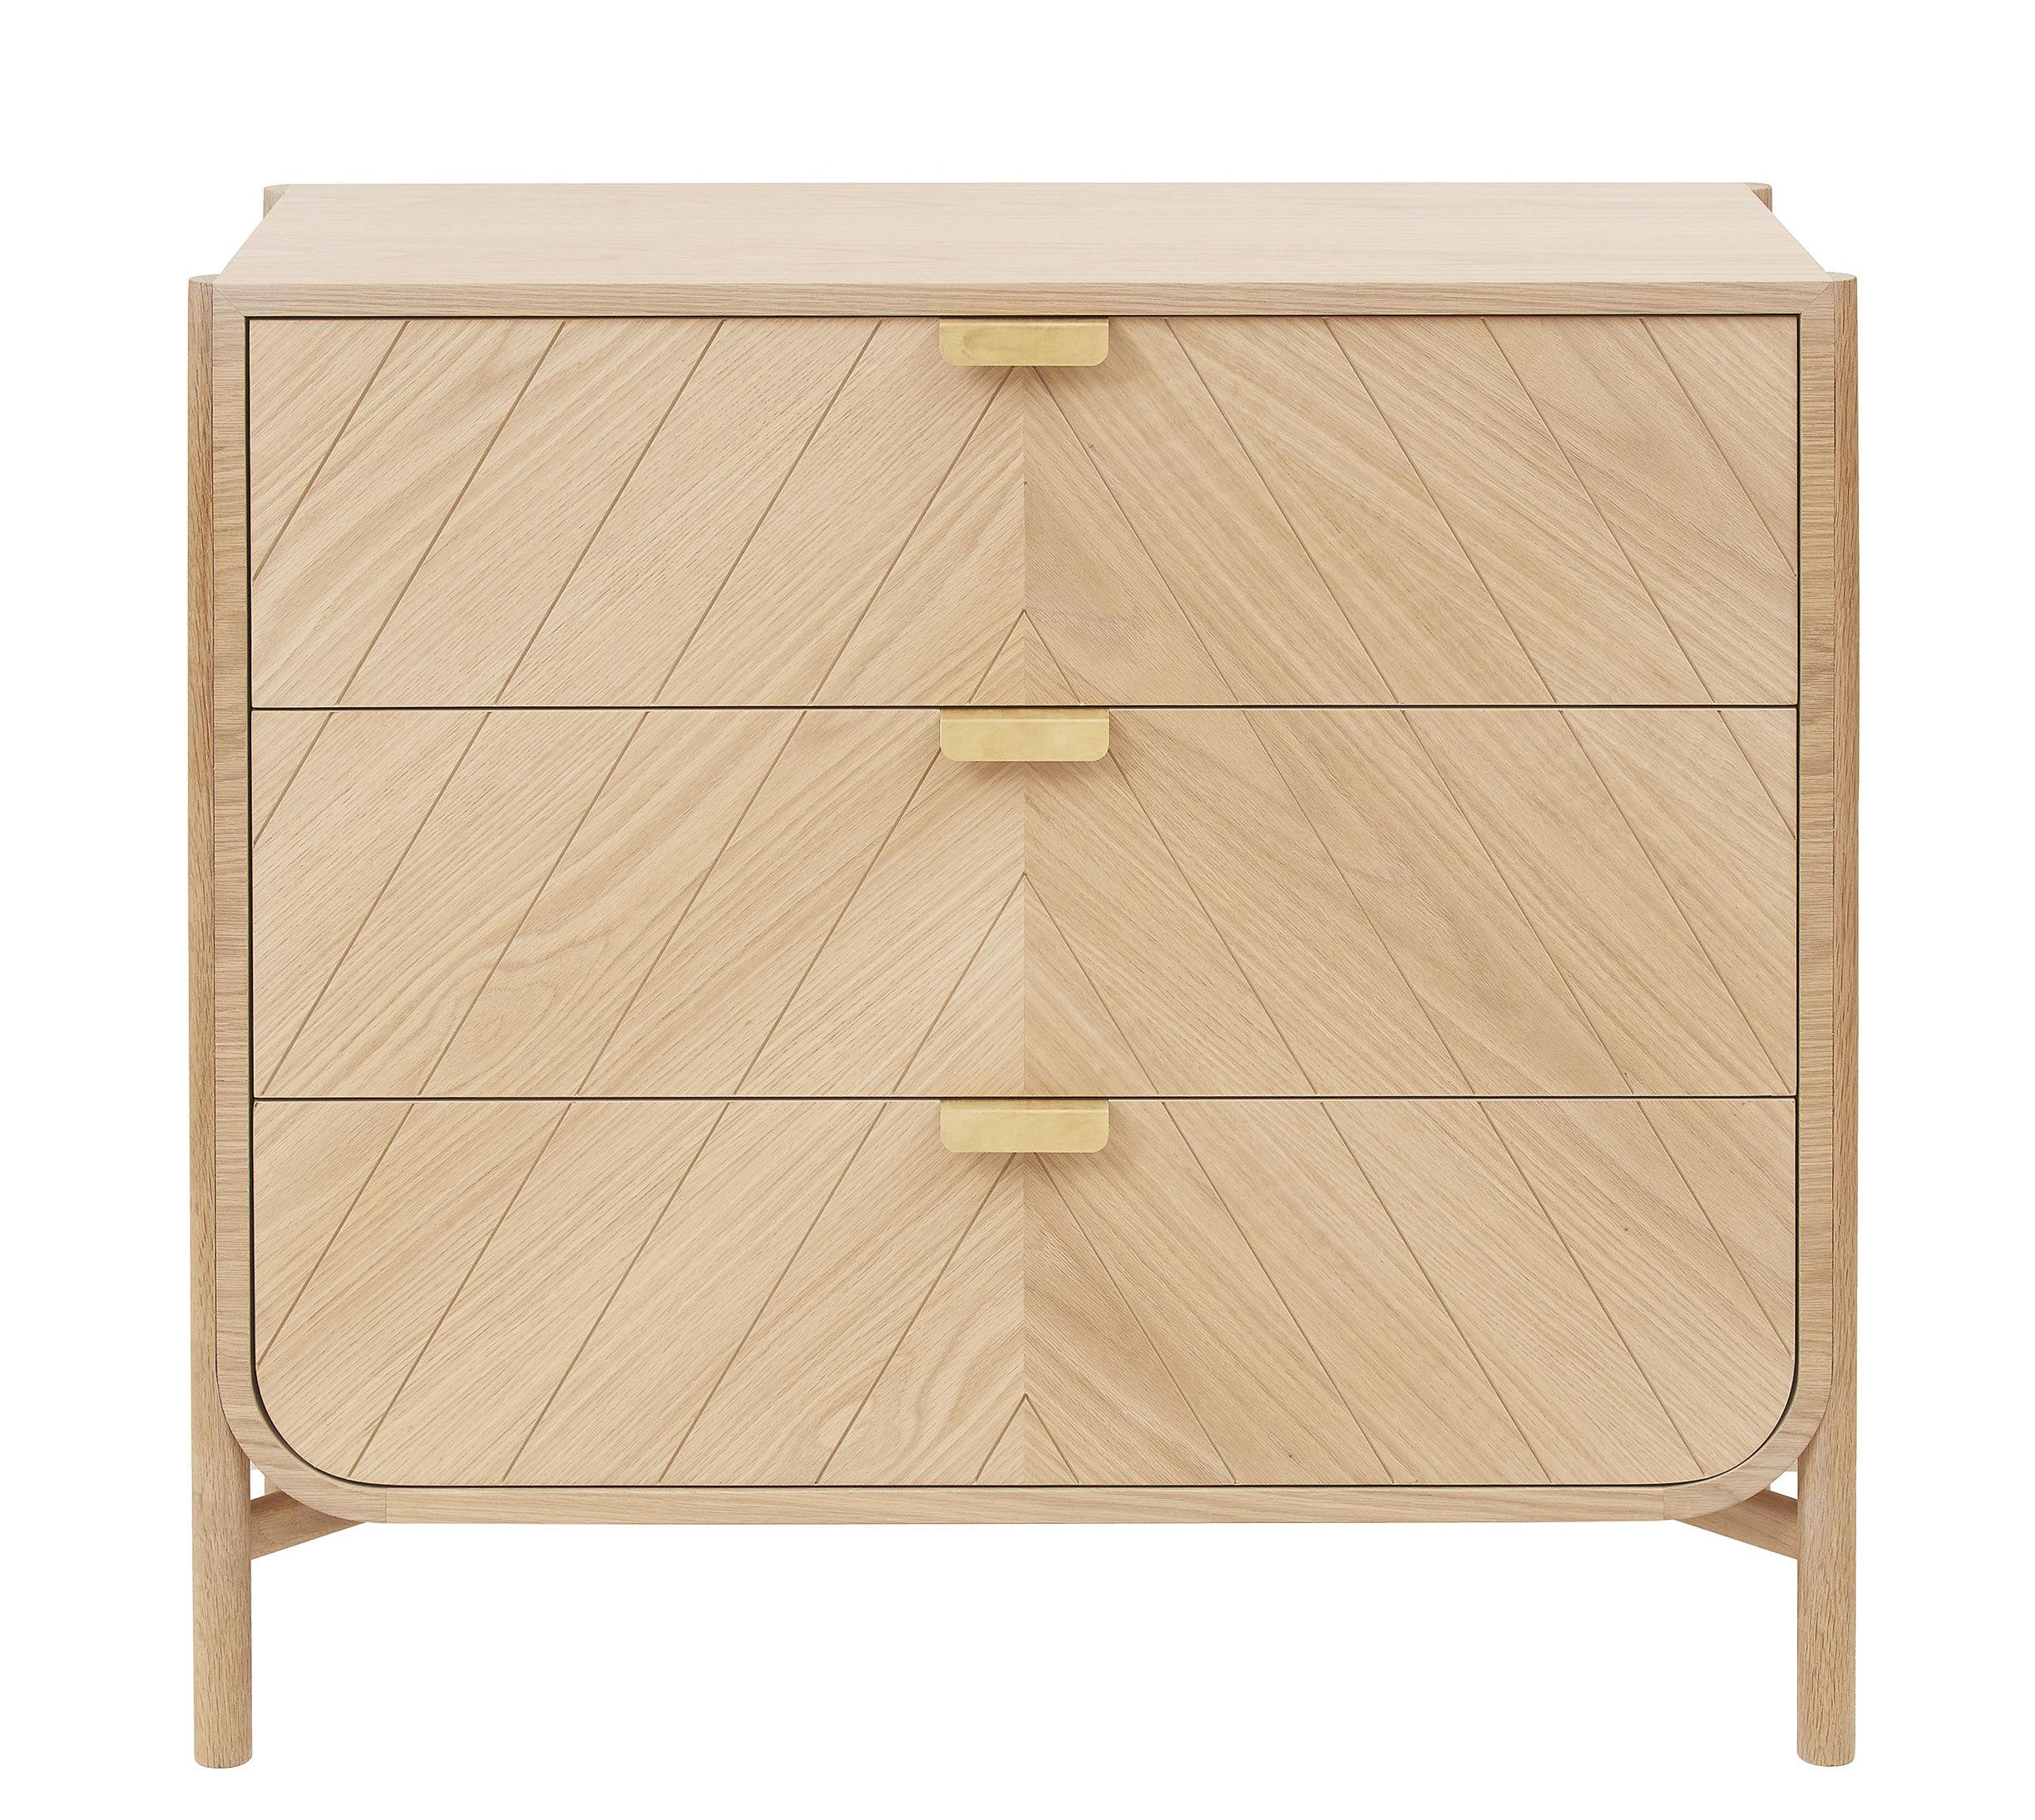 Furniture - Dressers & Storage Units - Marius Chest of drawers - L 100 x H 90 cm by Hartô - Natural oak - MDF veneer oak, Metal, Solid oak